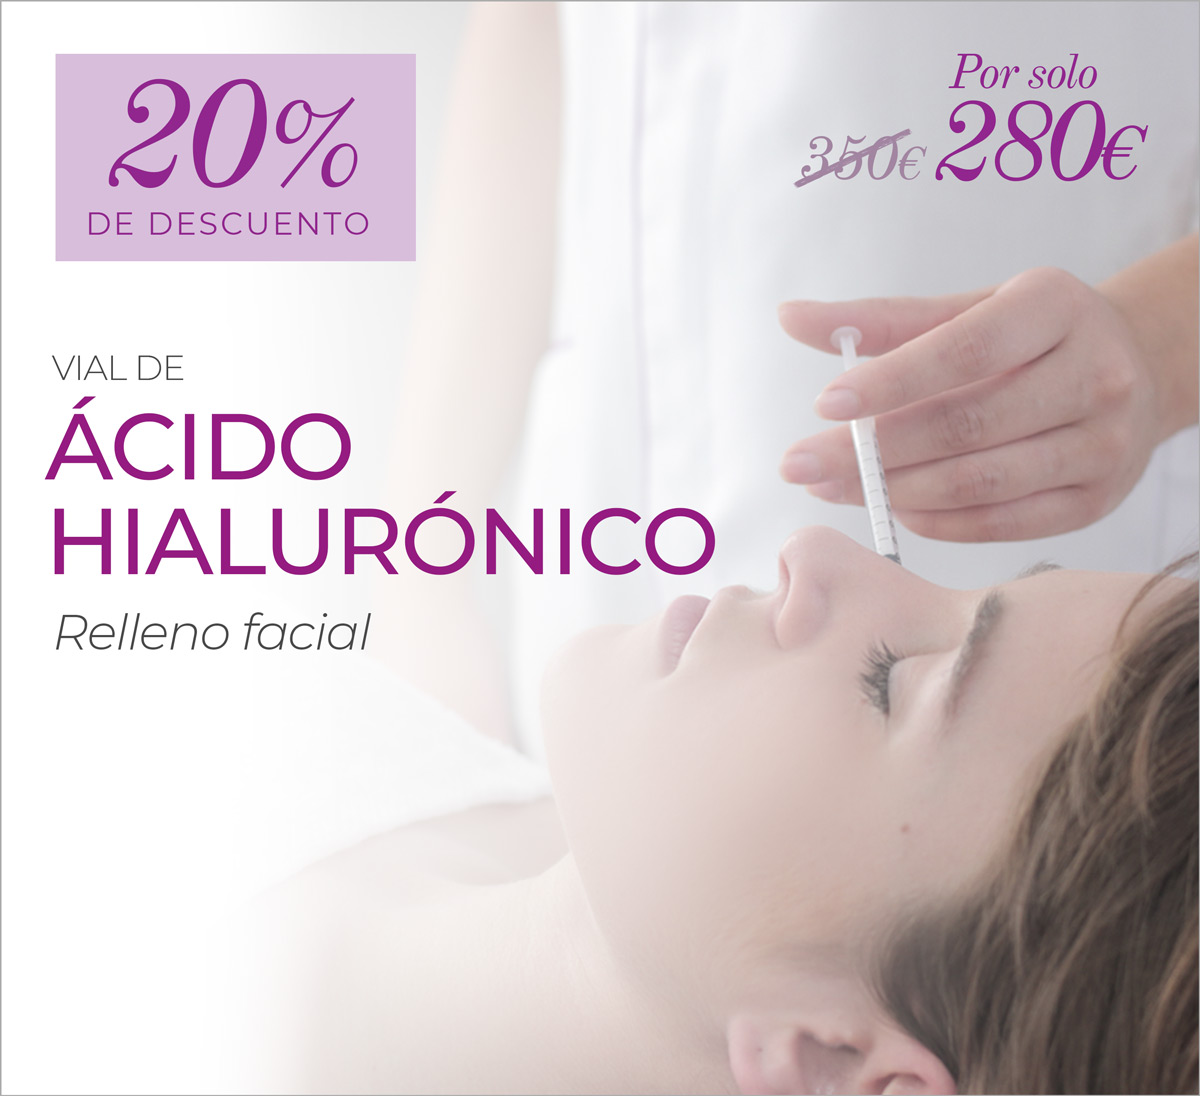 Vial De Relleno Facial Con ácido Hialurónico